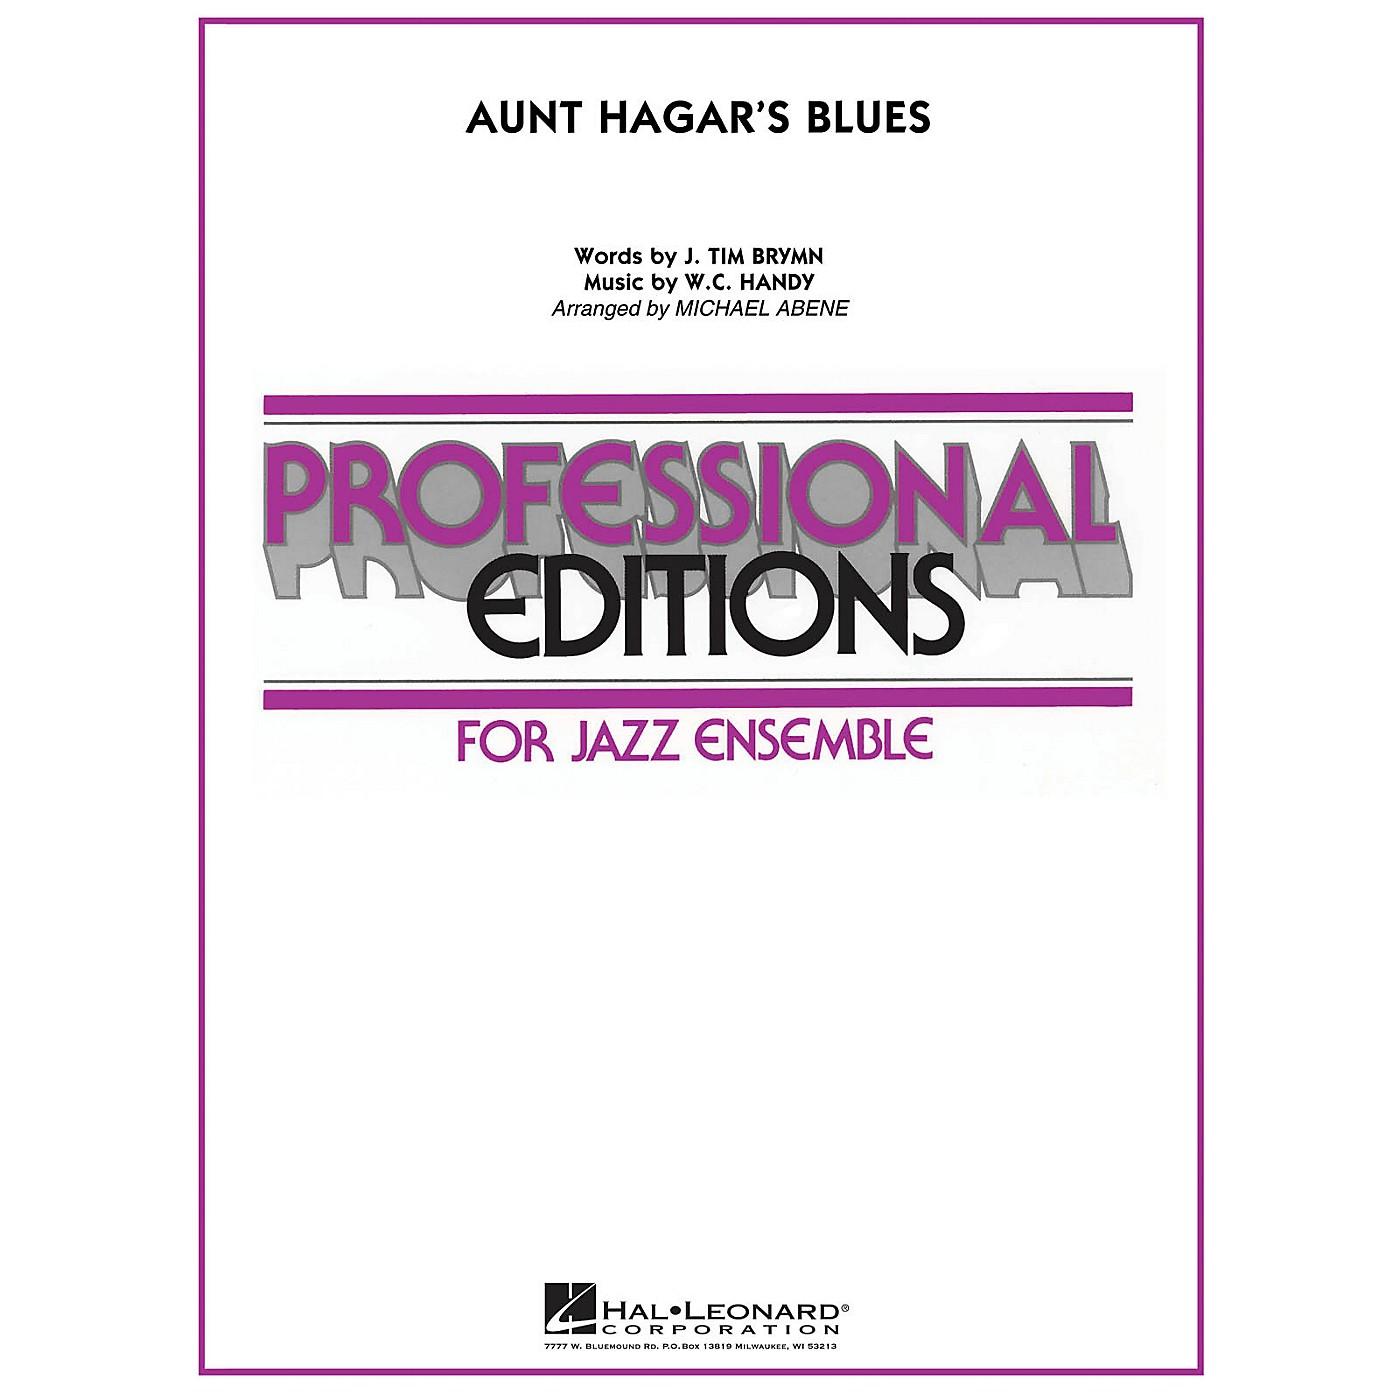 Hal Leonard Aunt Hagar's Blues Jazz Band Level 5-6 Arranged by Michael Abene thumbnail